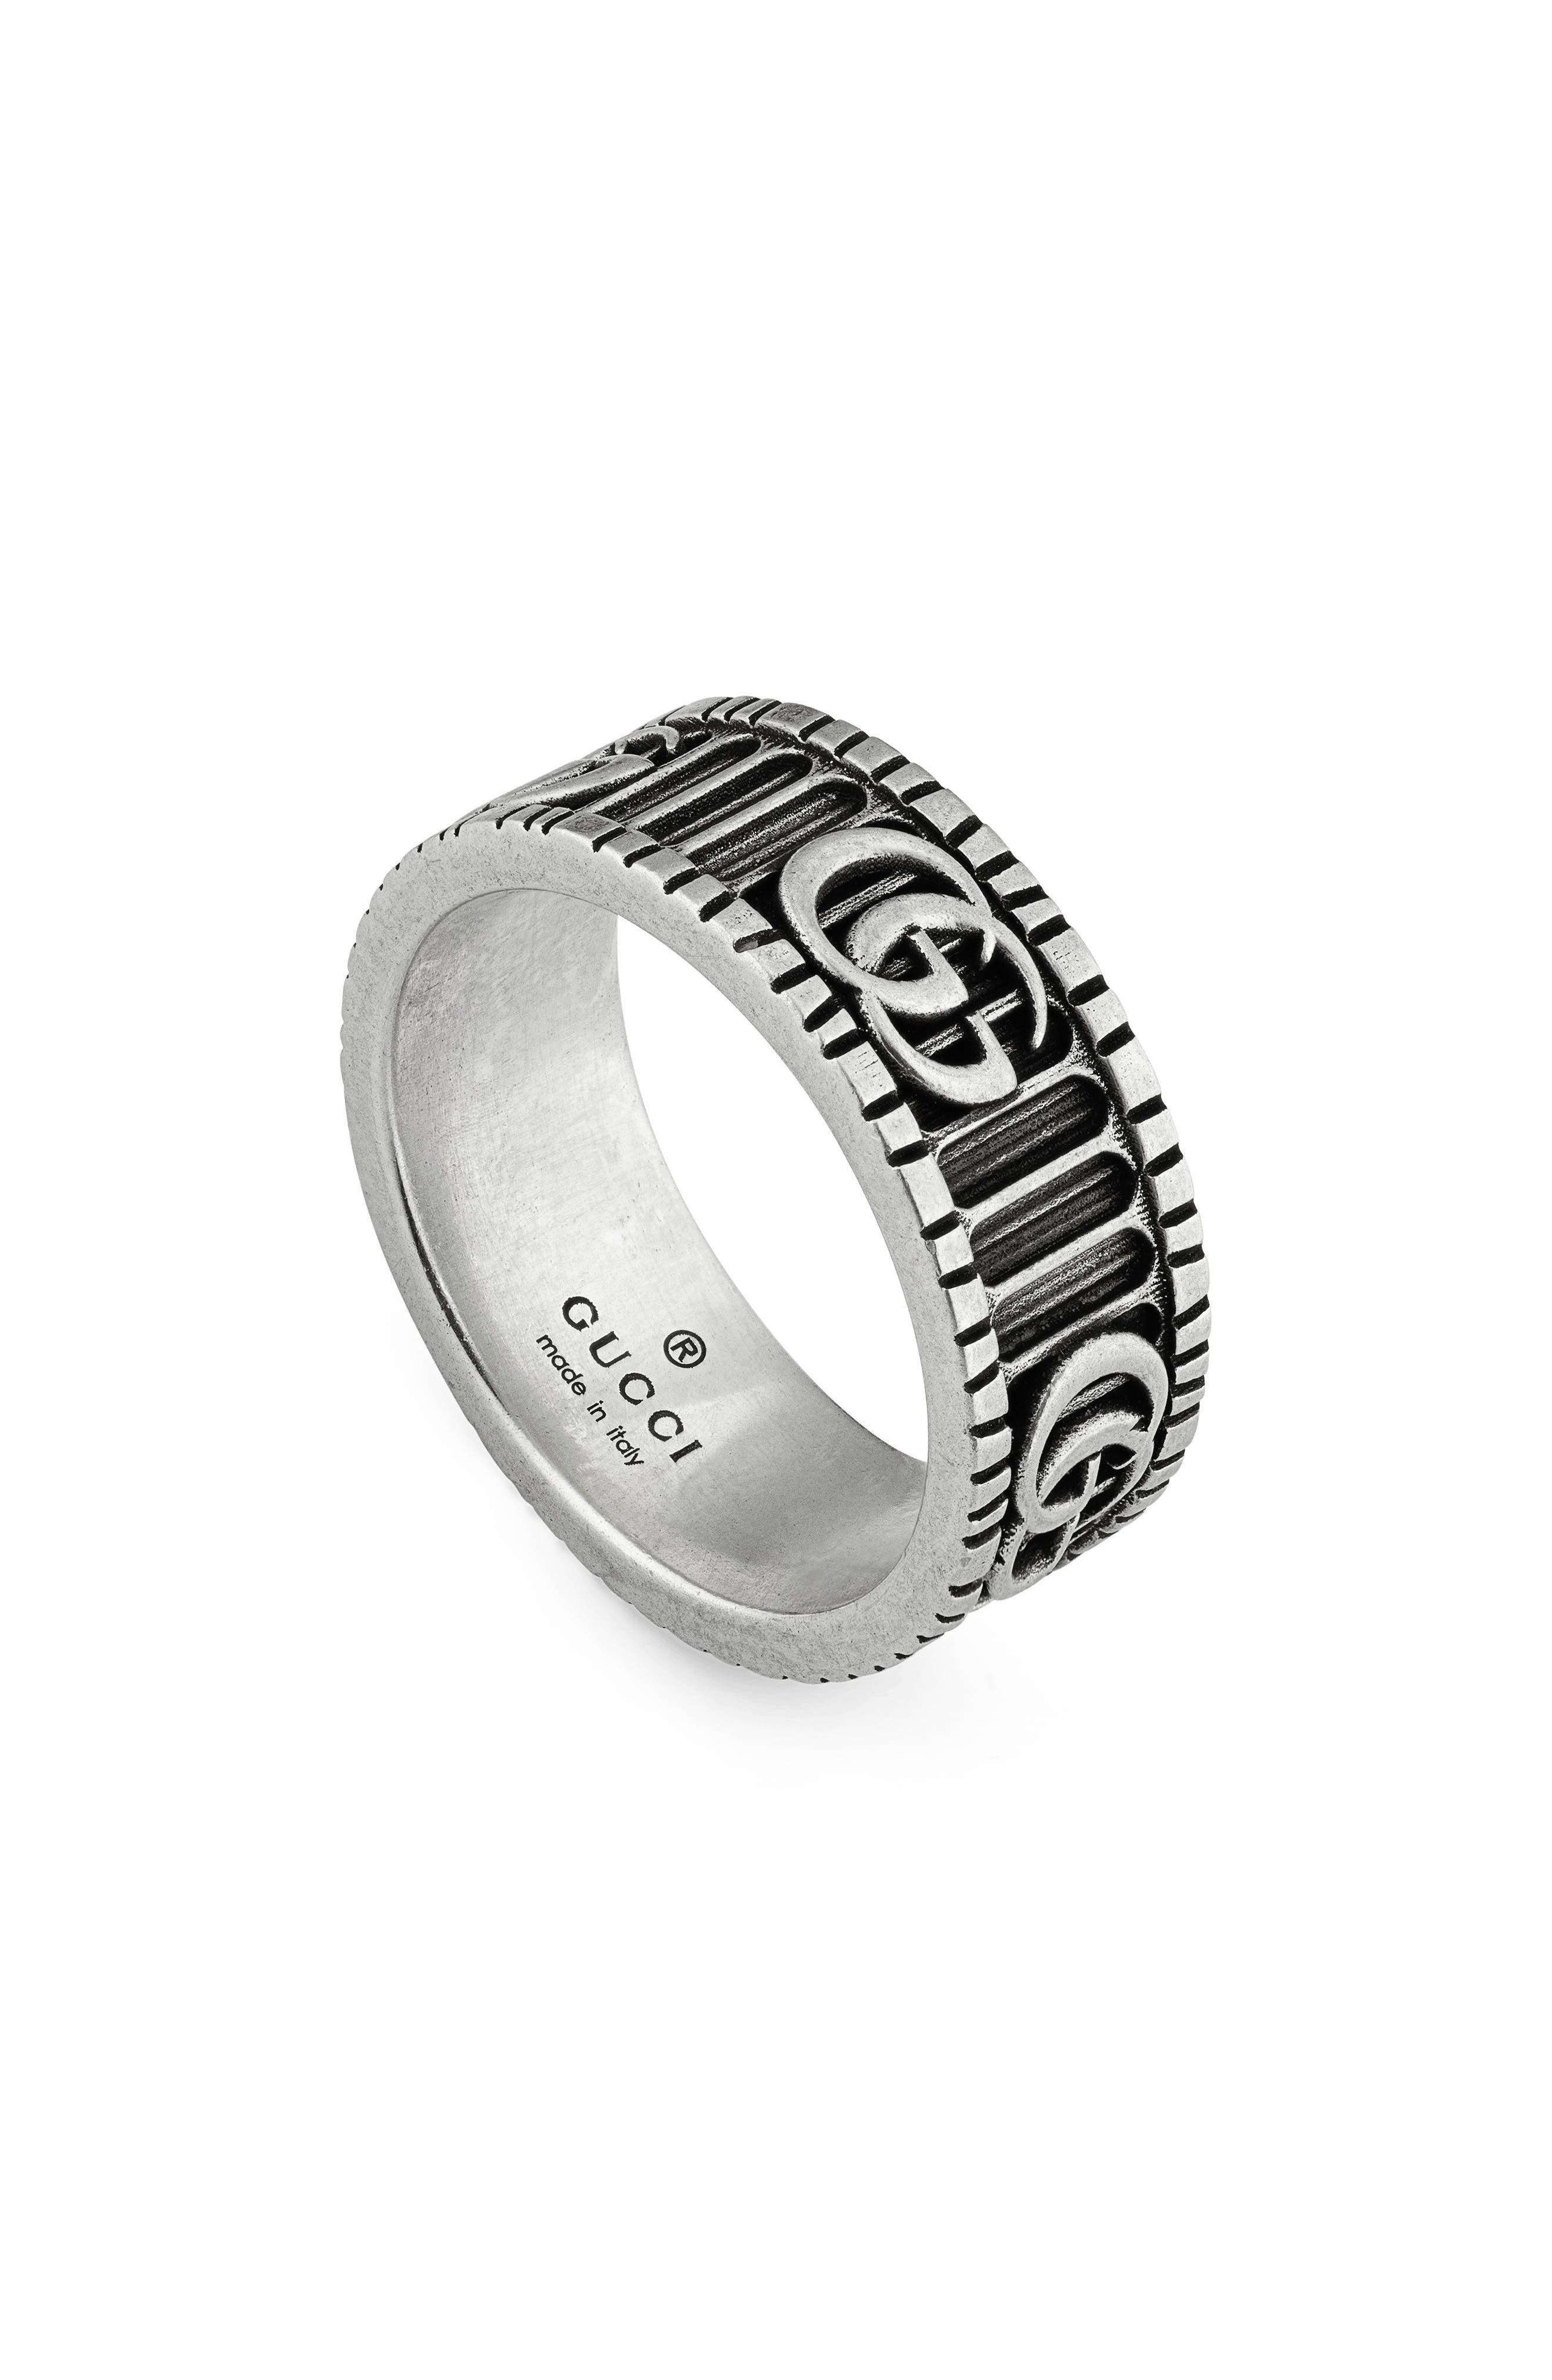 ea94e0ea39efad Gucci Fine Jewelry Rings for Women | Nordstrom